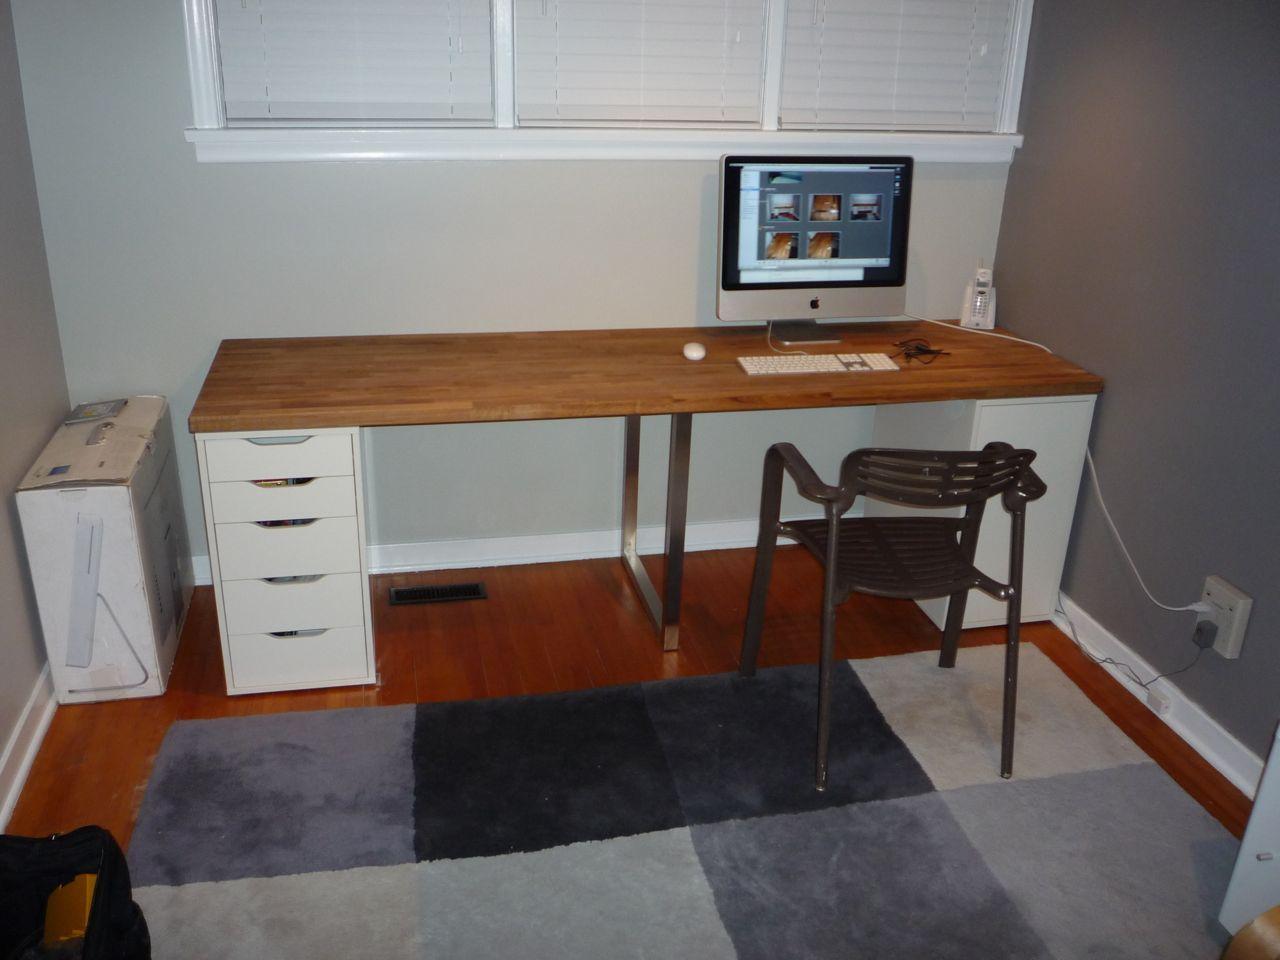 Fih0lejft17vqcbjpg 1280960 pixels ikea wooden desk